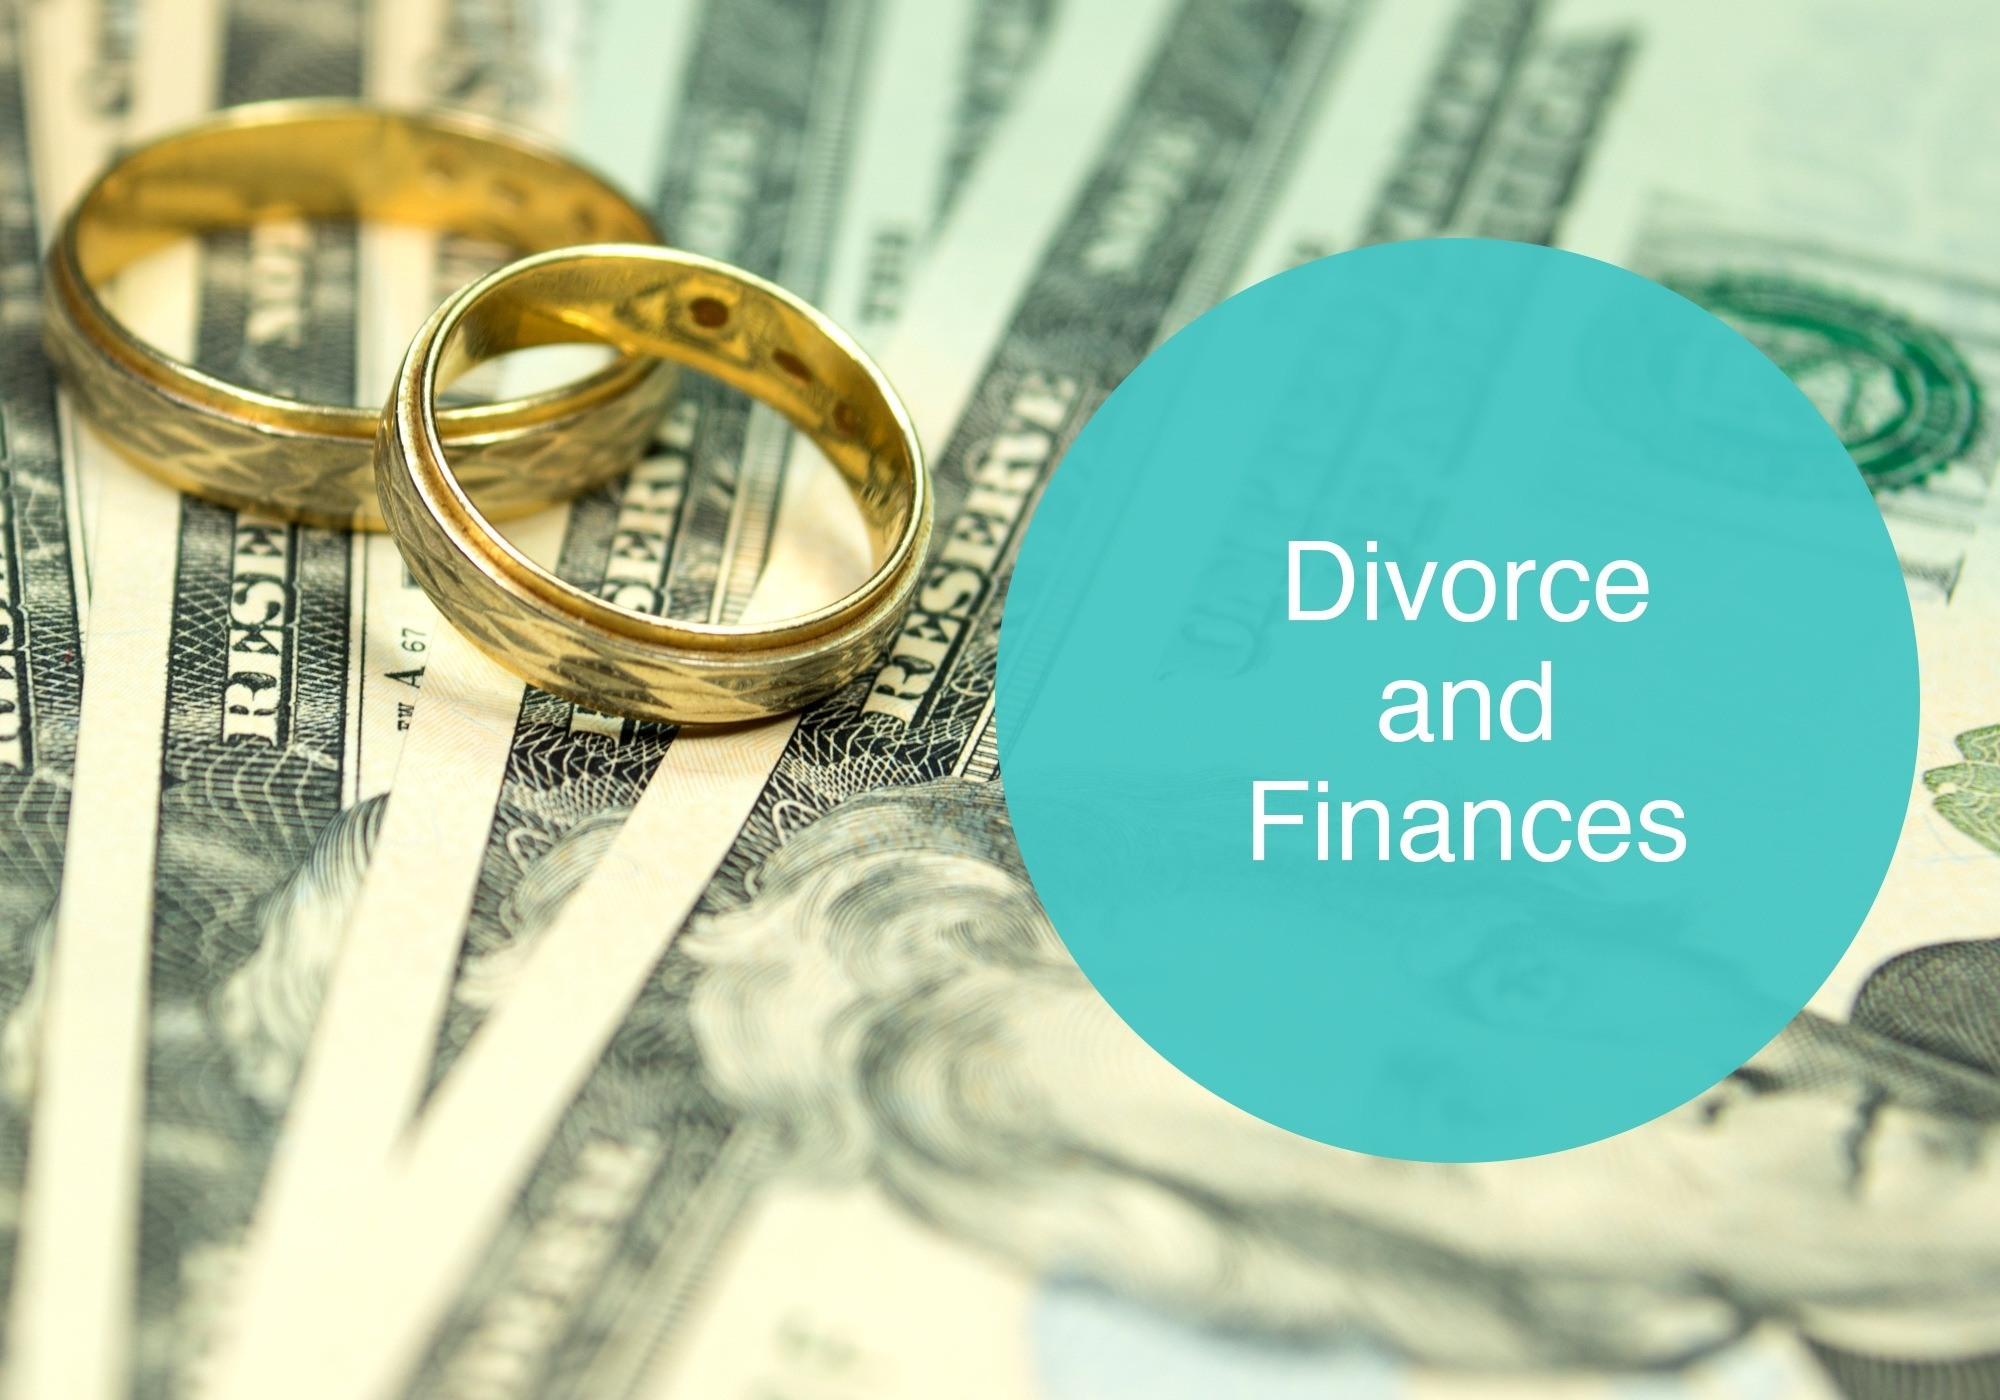 Divorce & Finances: How to Financially Prepare for Divorce